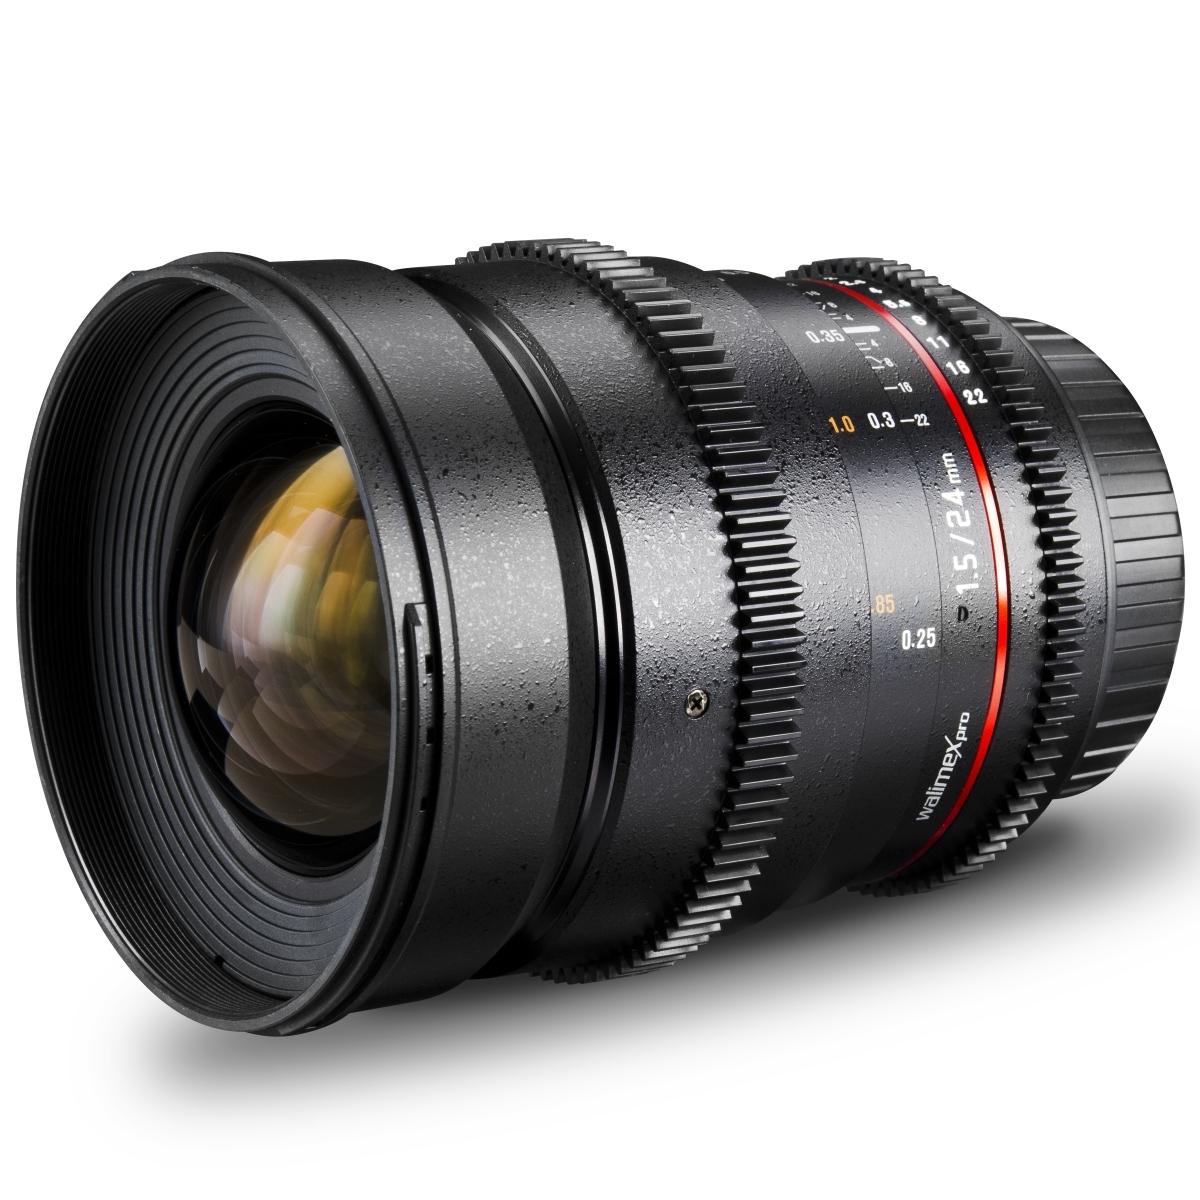 walimex pro 24/1,5 Superweitwinkel Objektiv VDSLR für Canon EF | eBay